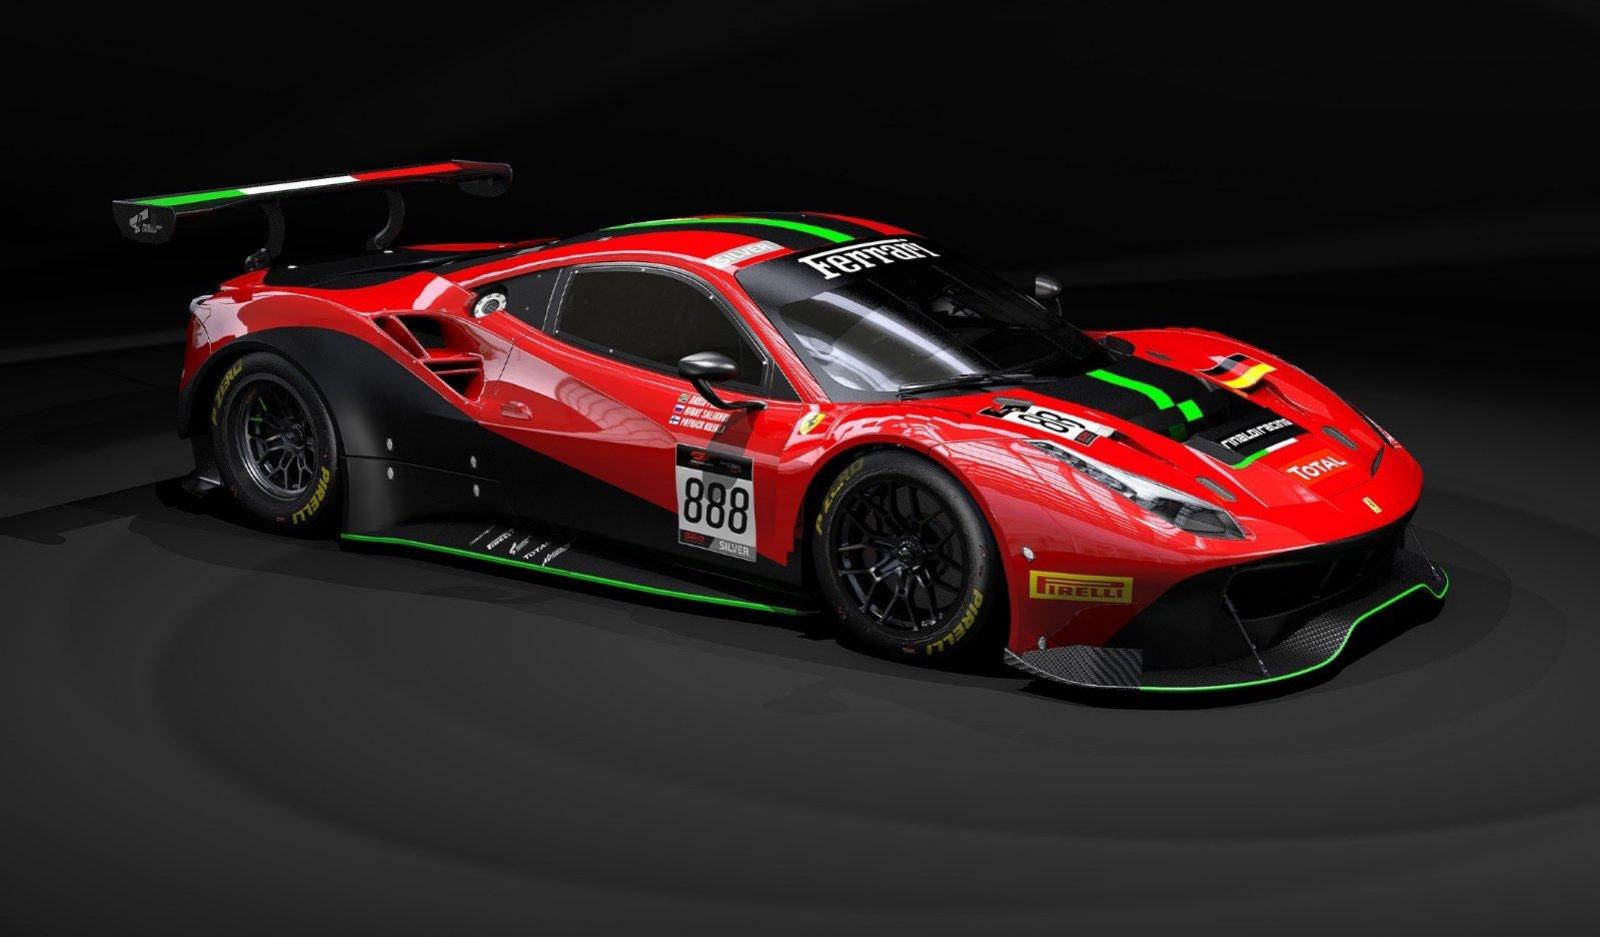 Ferrari Stalwart Rinaldi Racing Reveals 2020 Plans Fanatec Gt World Challenge Europe Powered By Aws